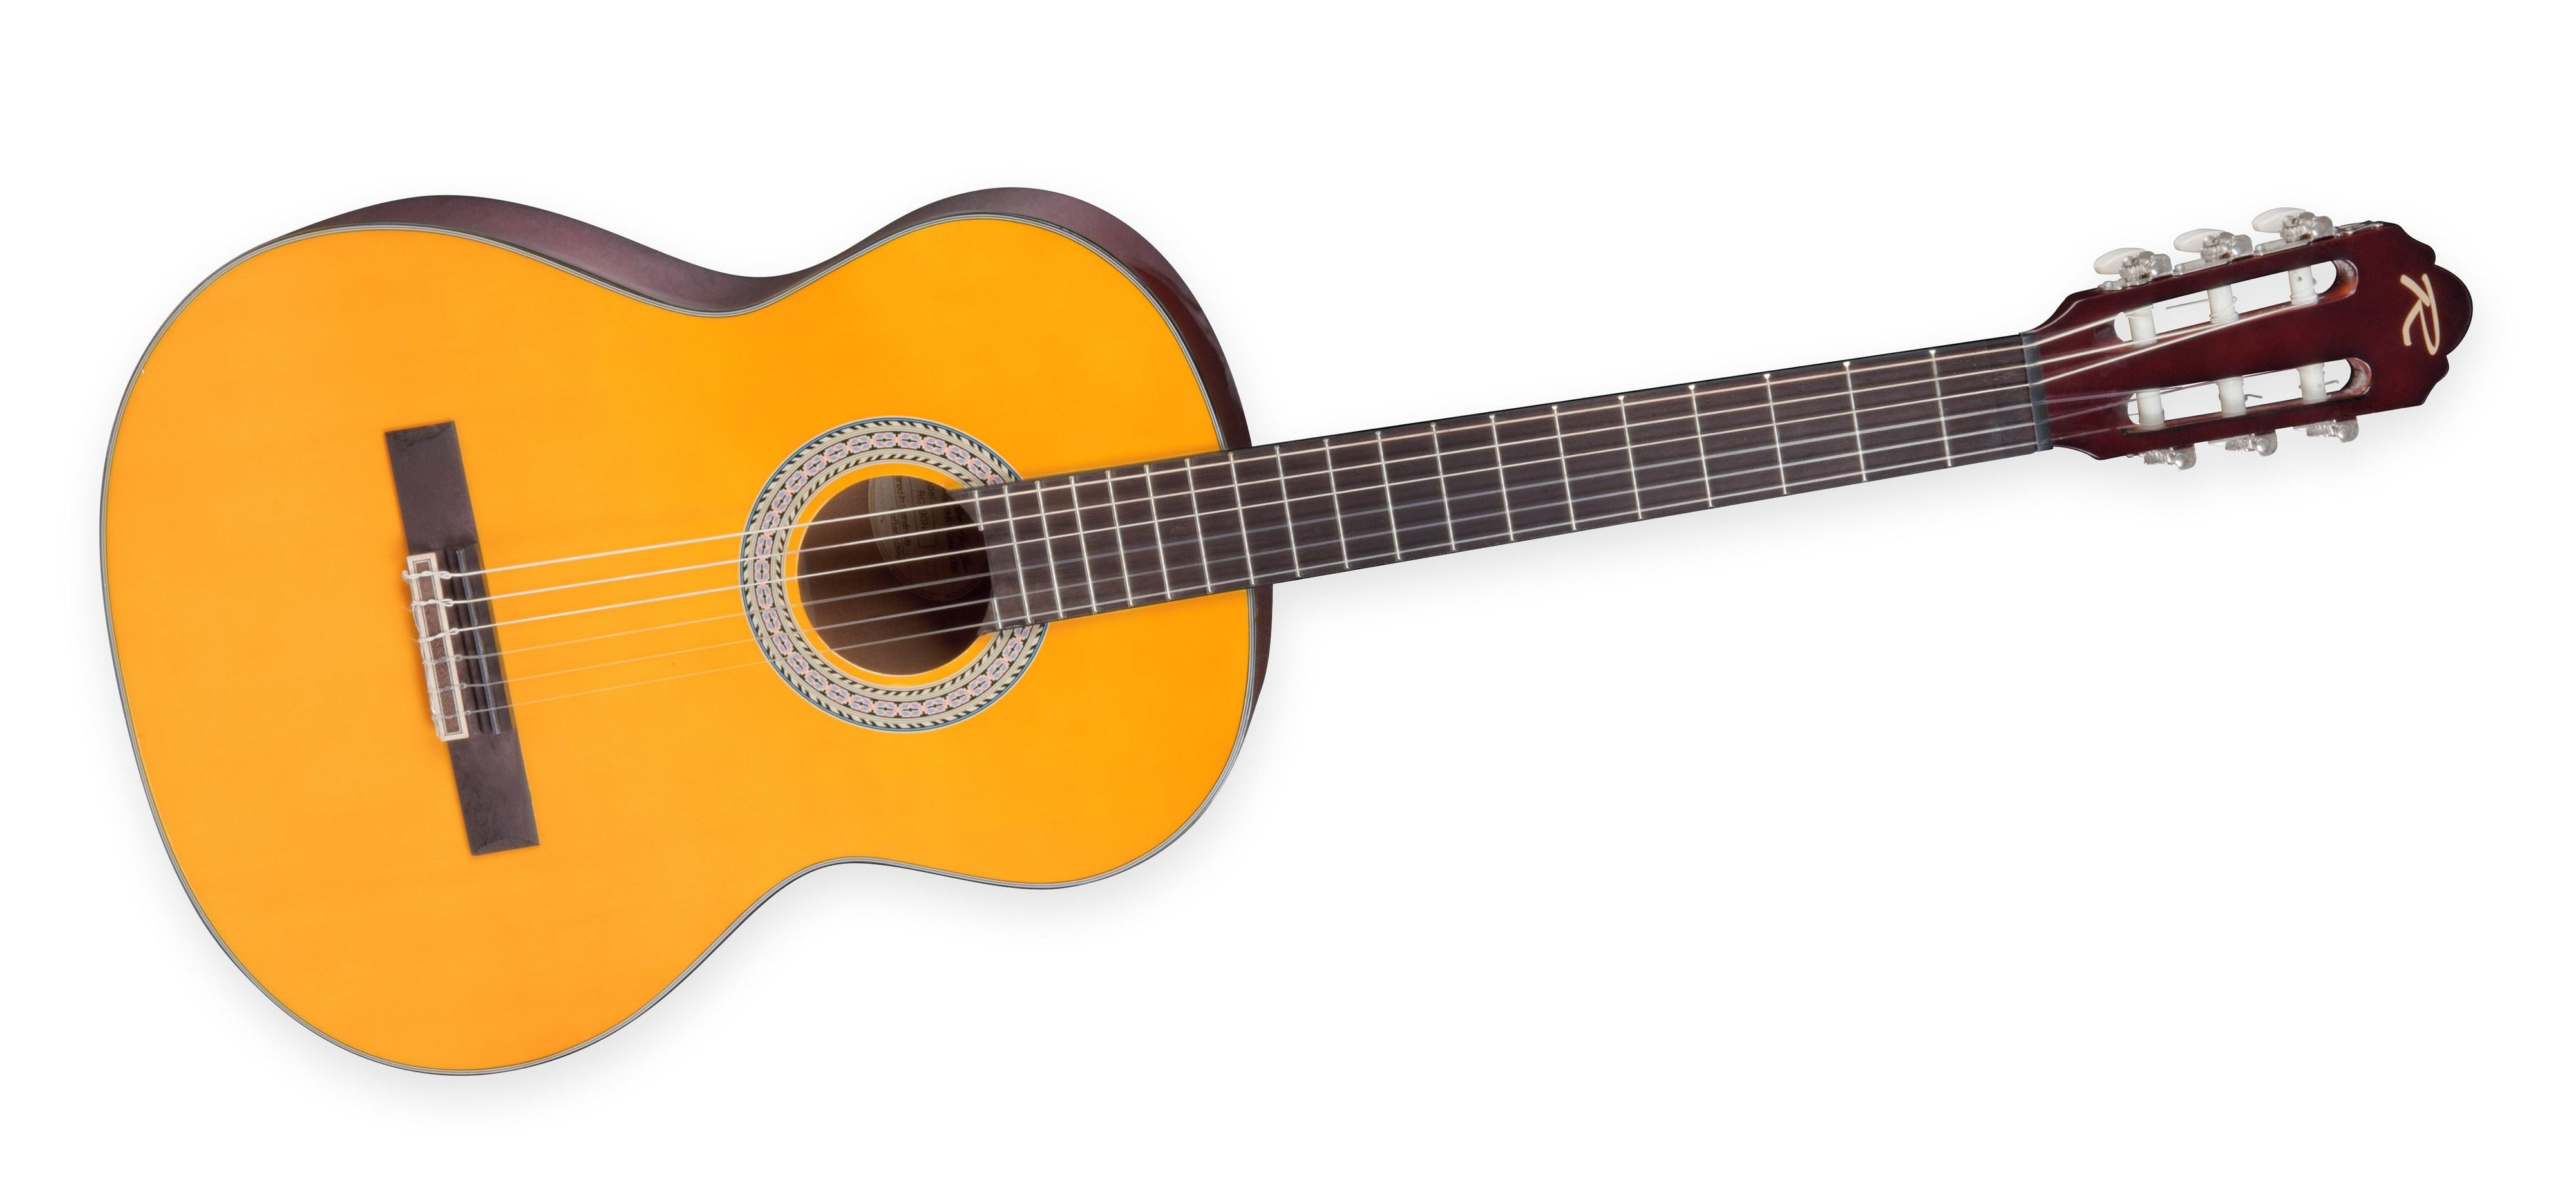 RENO RC190N Classical Guitar - 4/4 size